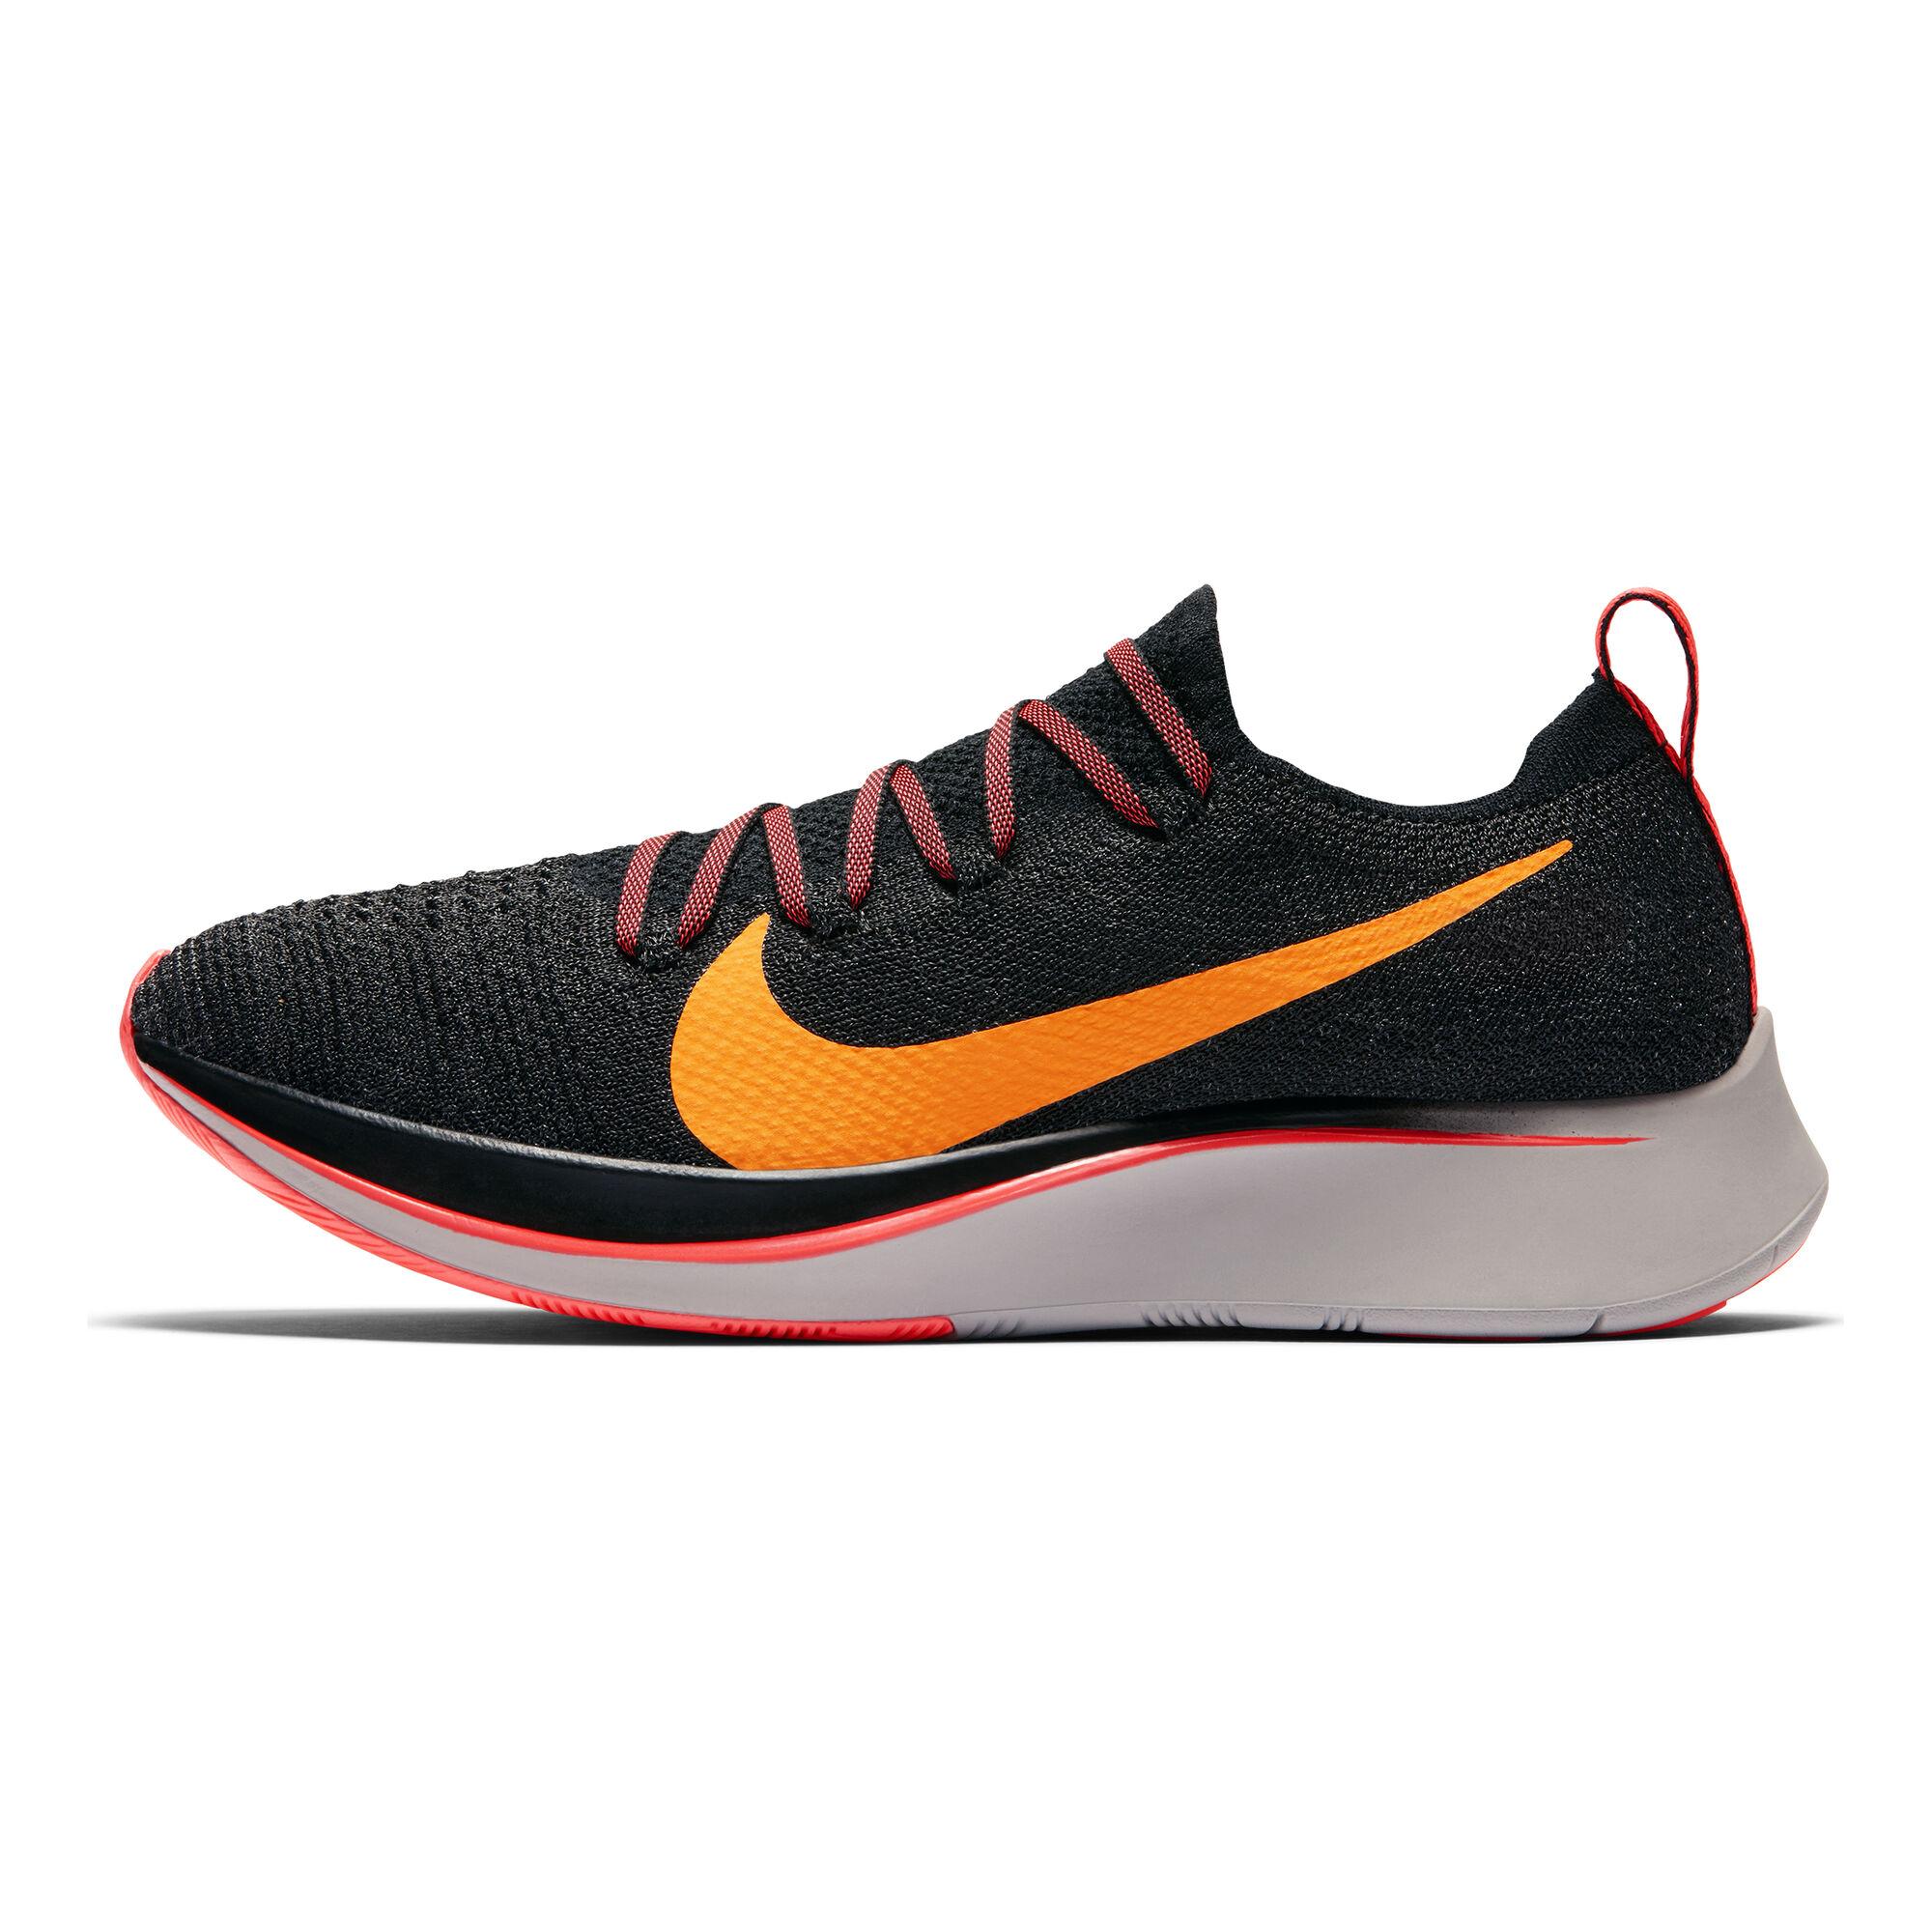 best authentic 1a8ab 8ded7 Nike  Nike  Nike  Nike  Nike  Nike  Nike  Nike  Nike  Nike. Zoom Fly Flyknit  ...